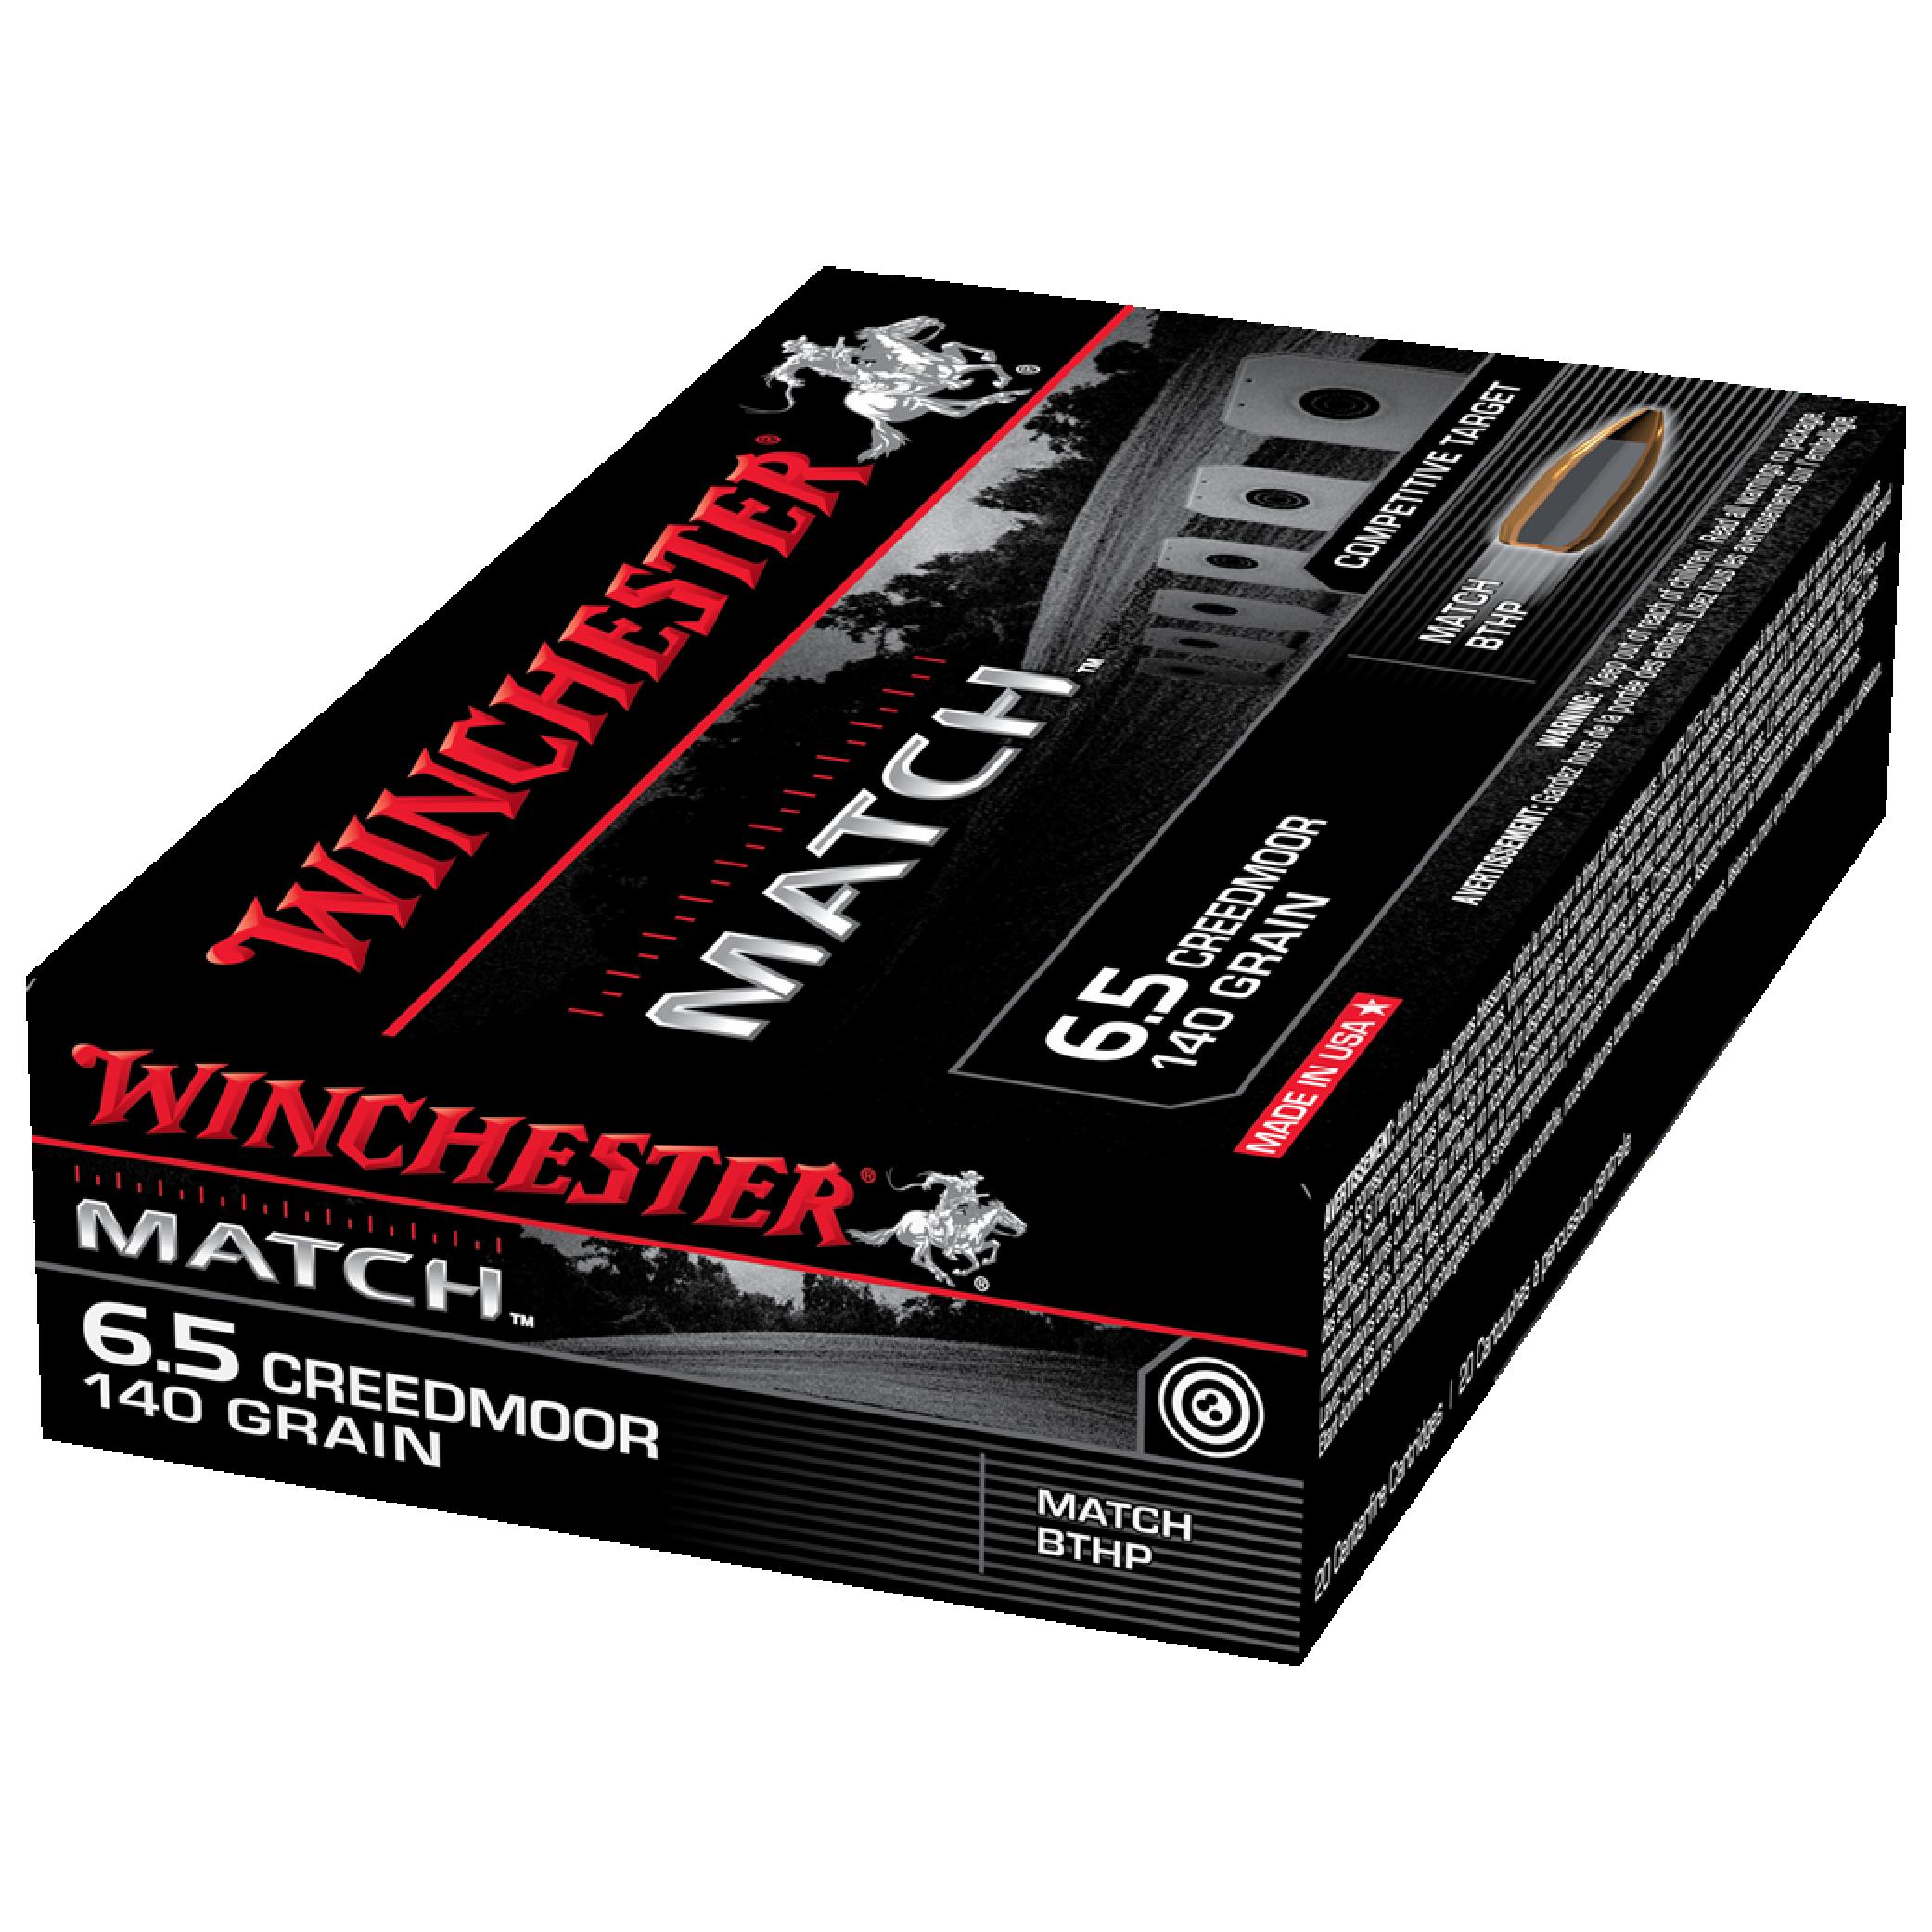 Winchester Match 6.5 Creedmoor 140gr